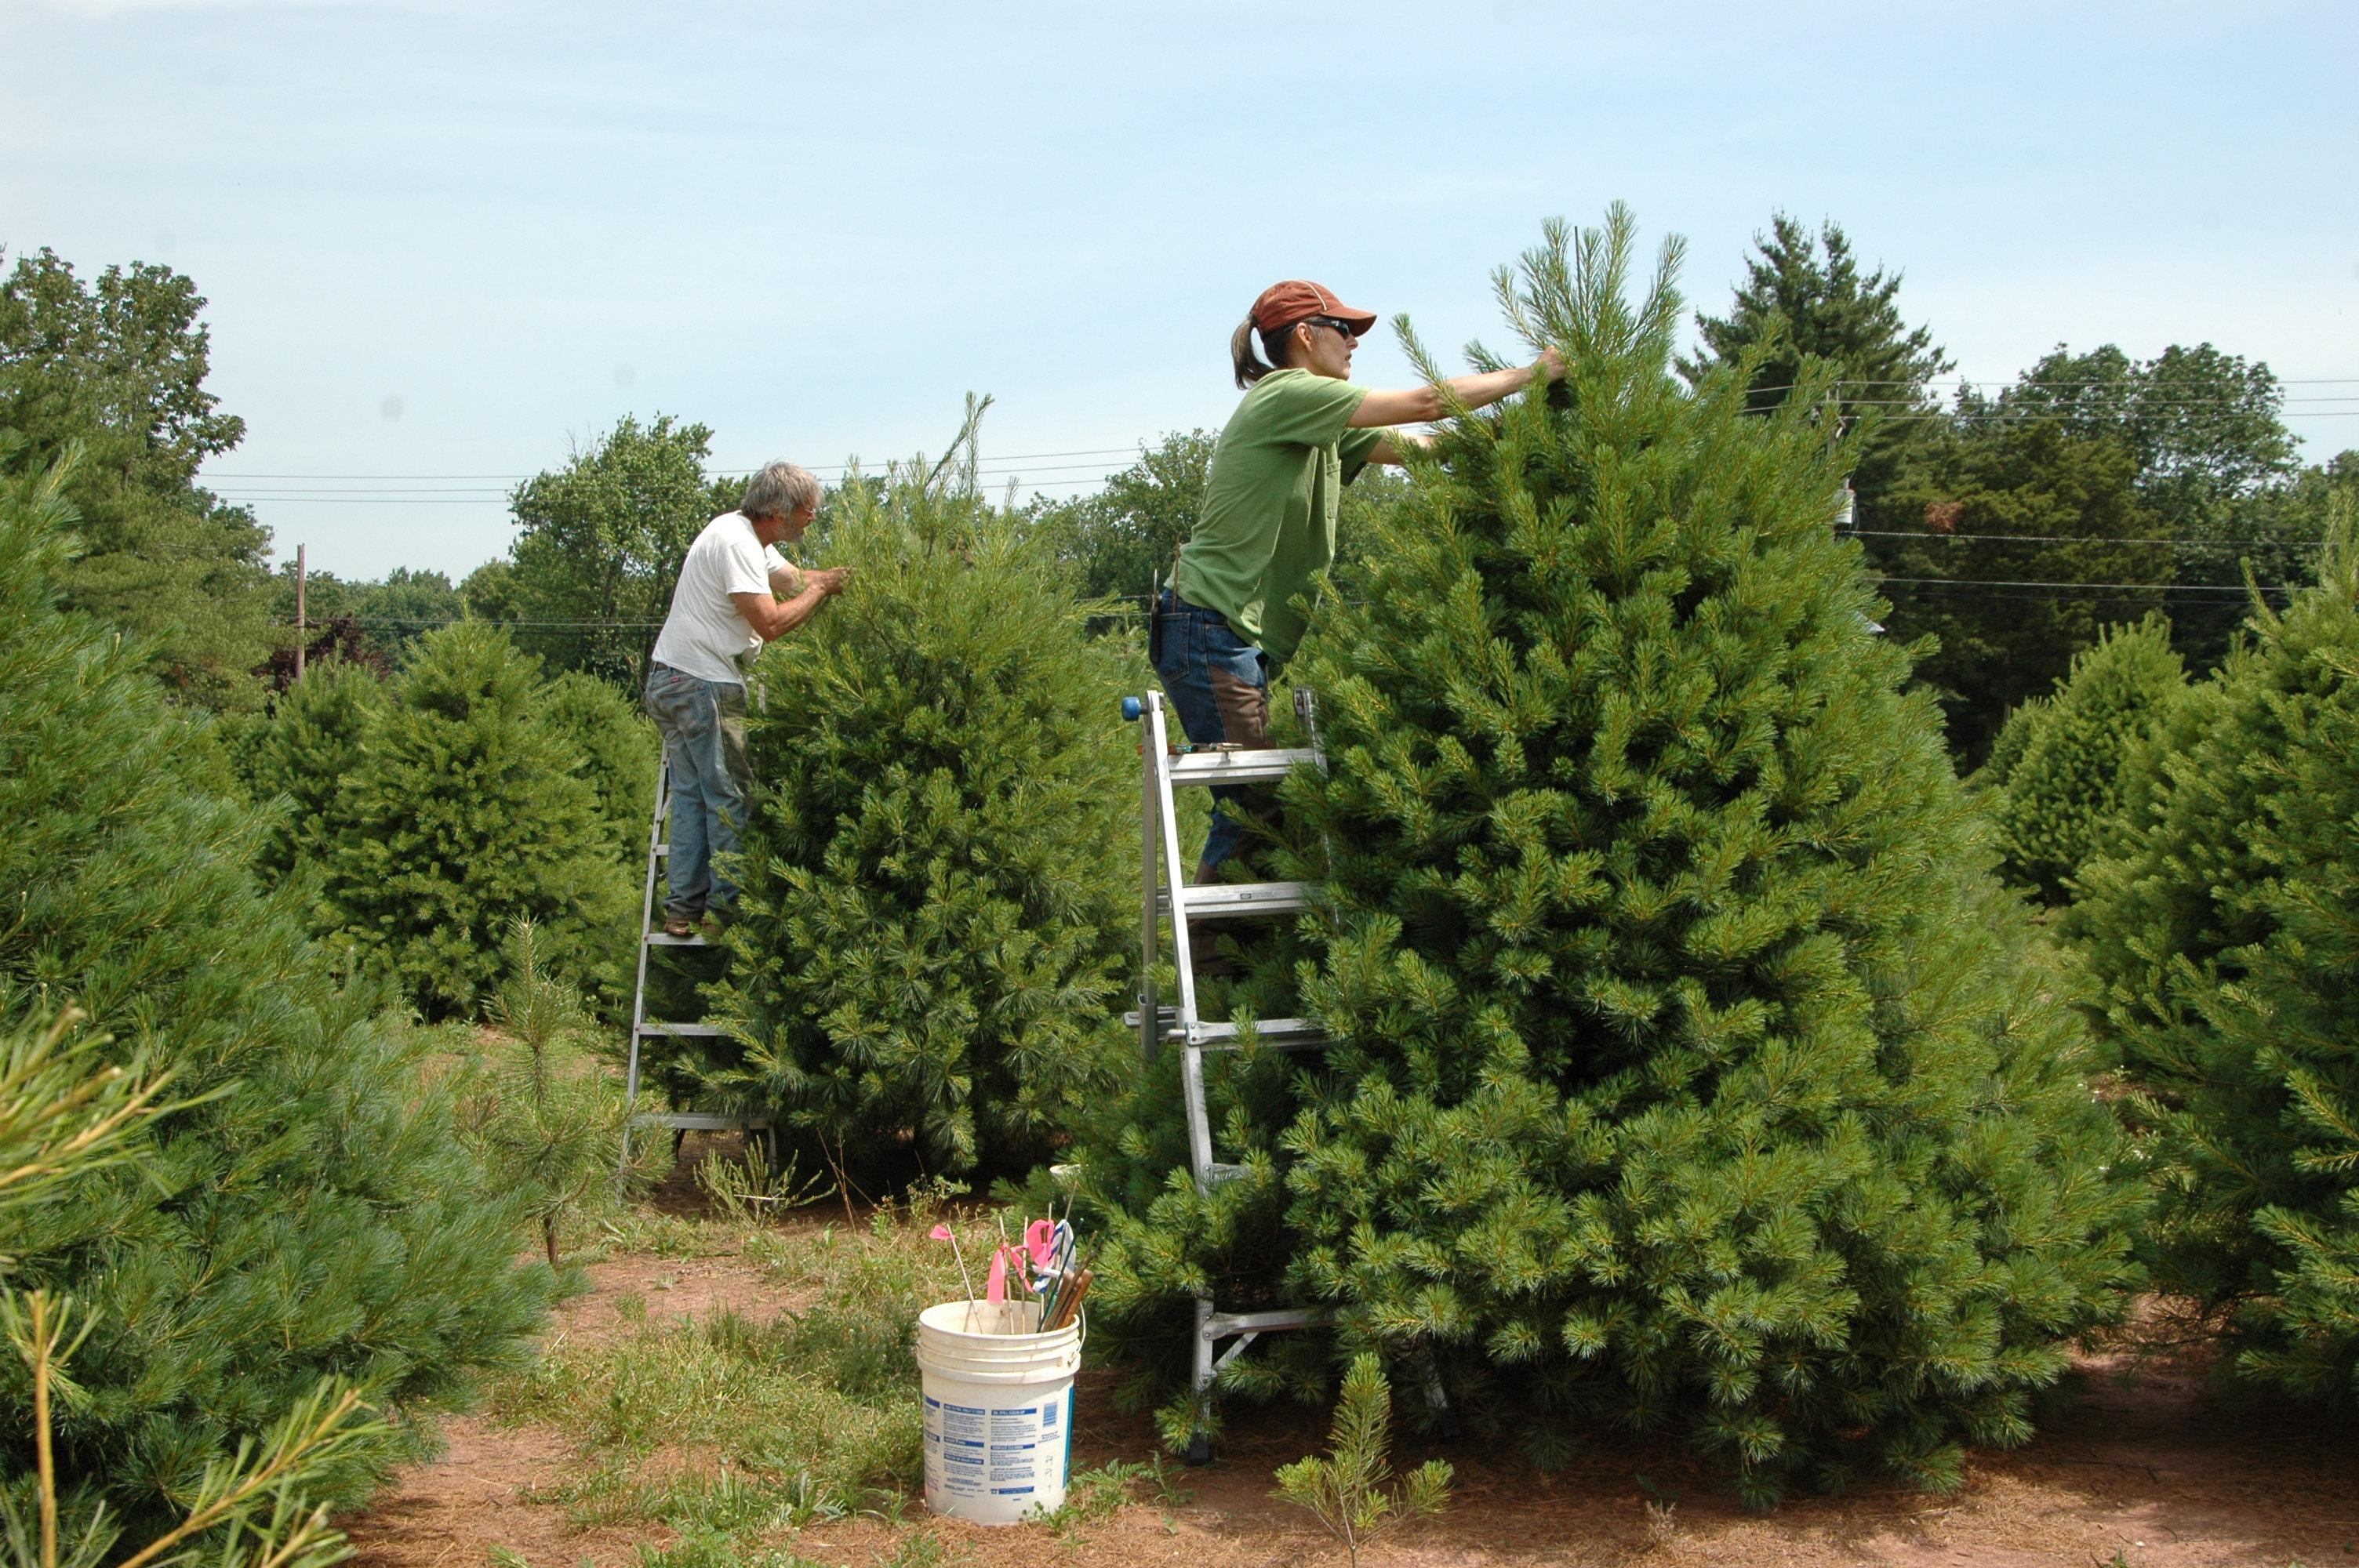 It S Pine Time At Wolgast Tree Farm